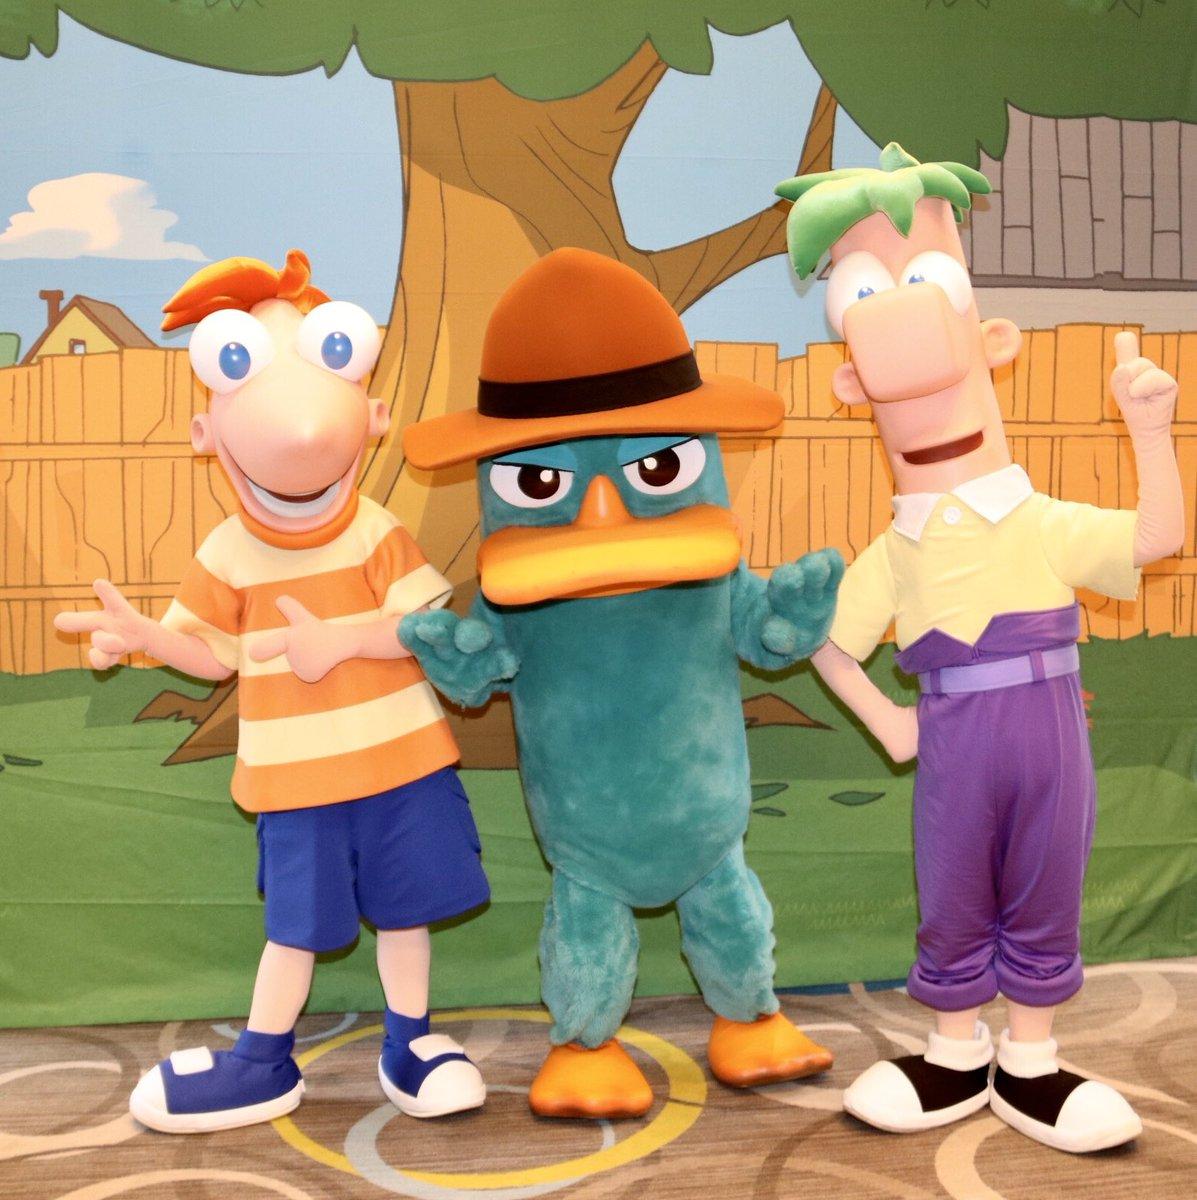 Today's gonna be a great day! #AgentP #Phineas #Ferb #PhineasandFerb #Perry #PerrythePlatypus #DisneyChannel #WDW #WaltDisneyWorldpic.twitter.com/ubreEMUxZi